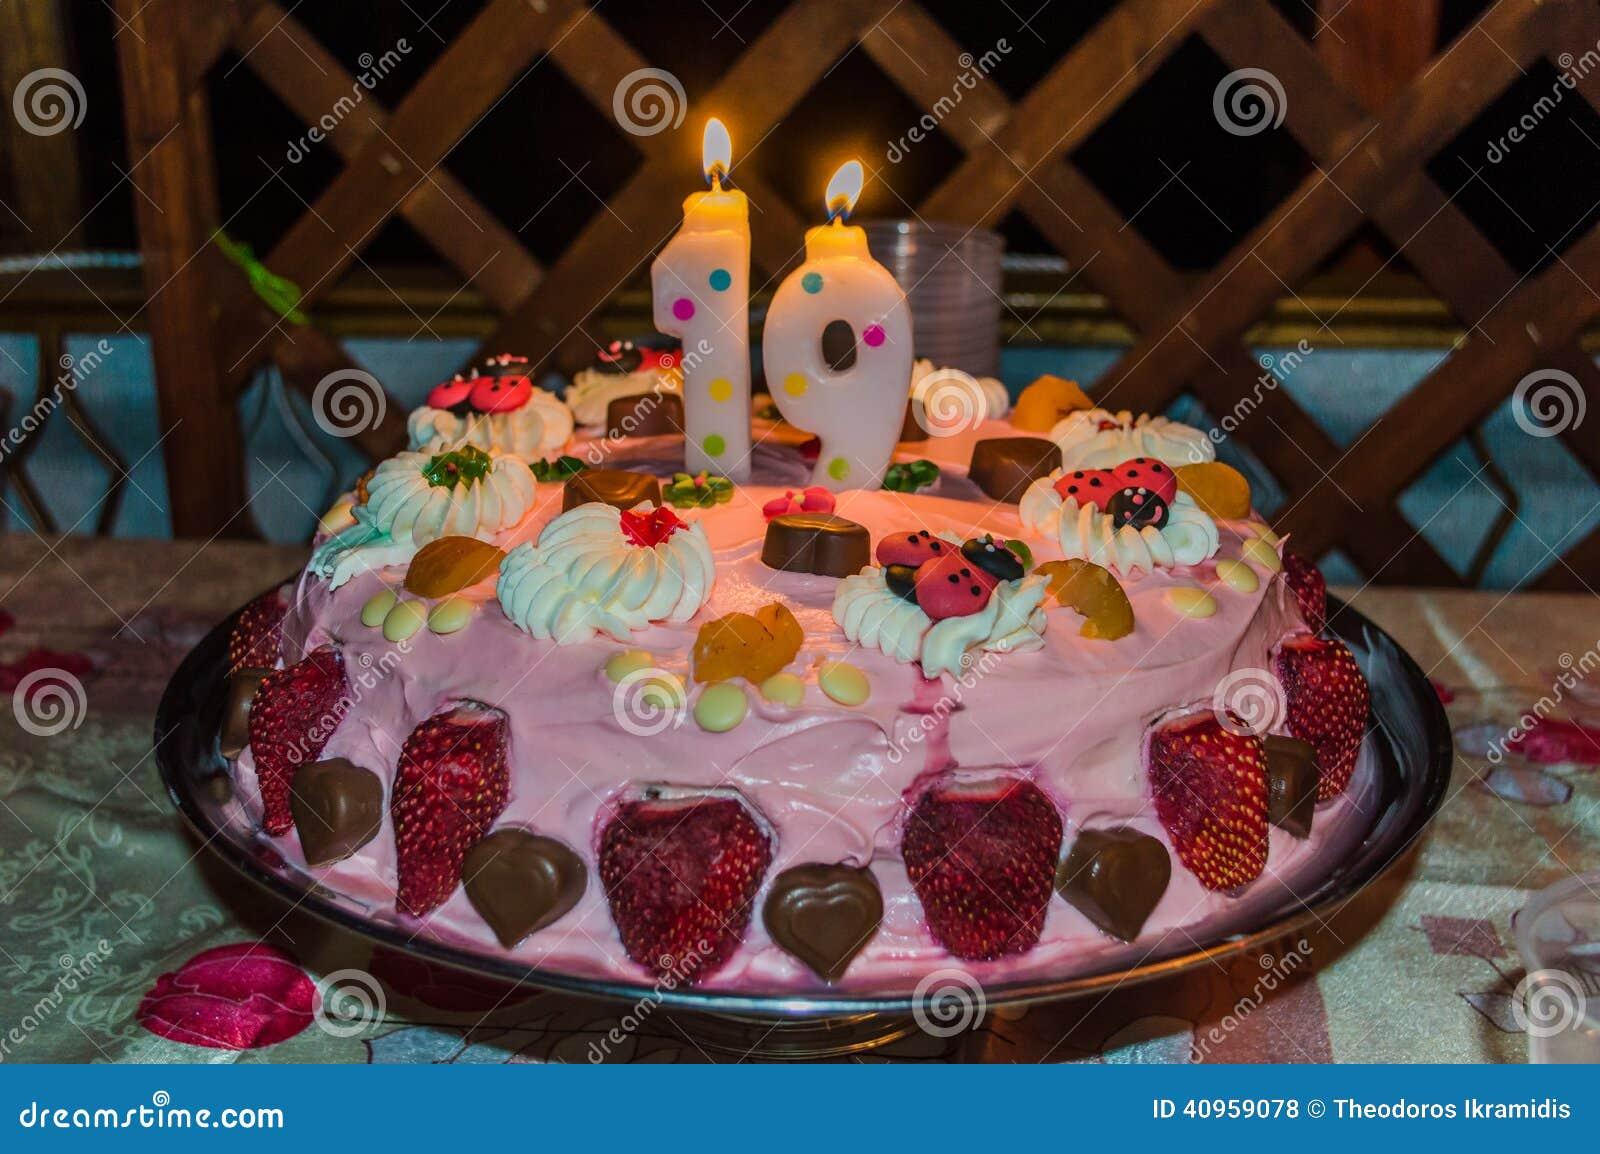 19 year old birthday cakes